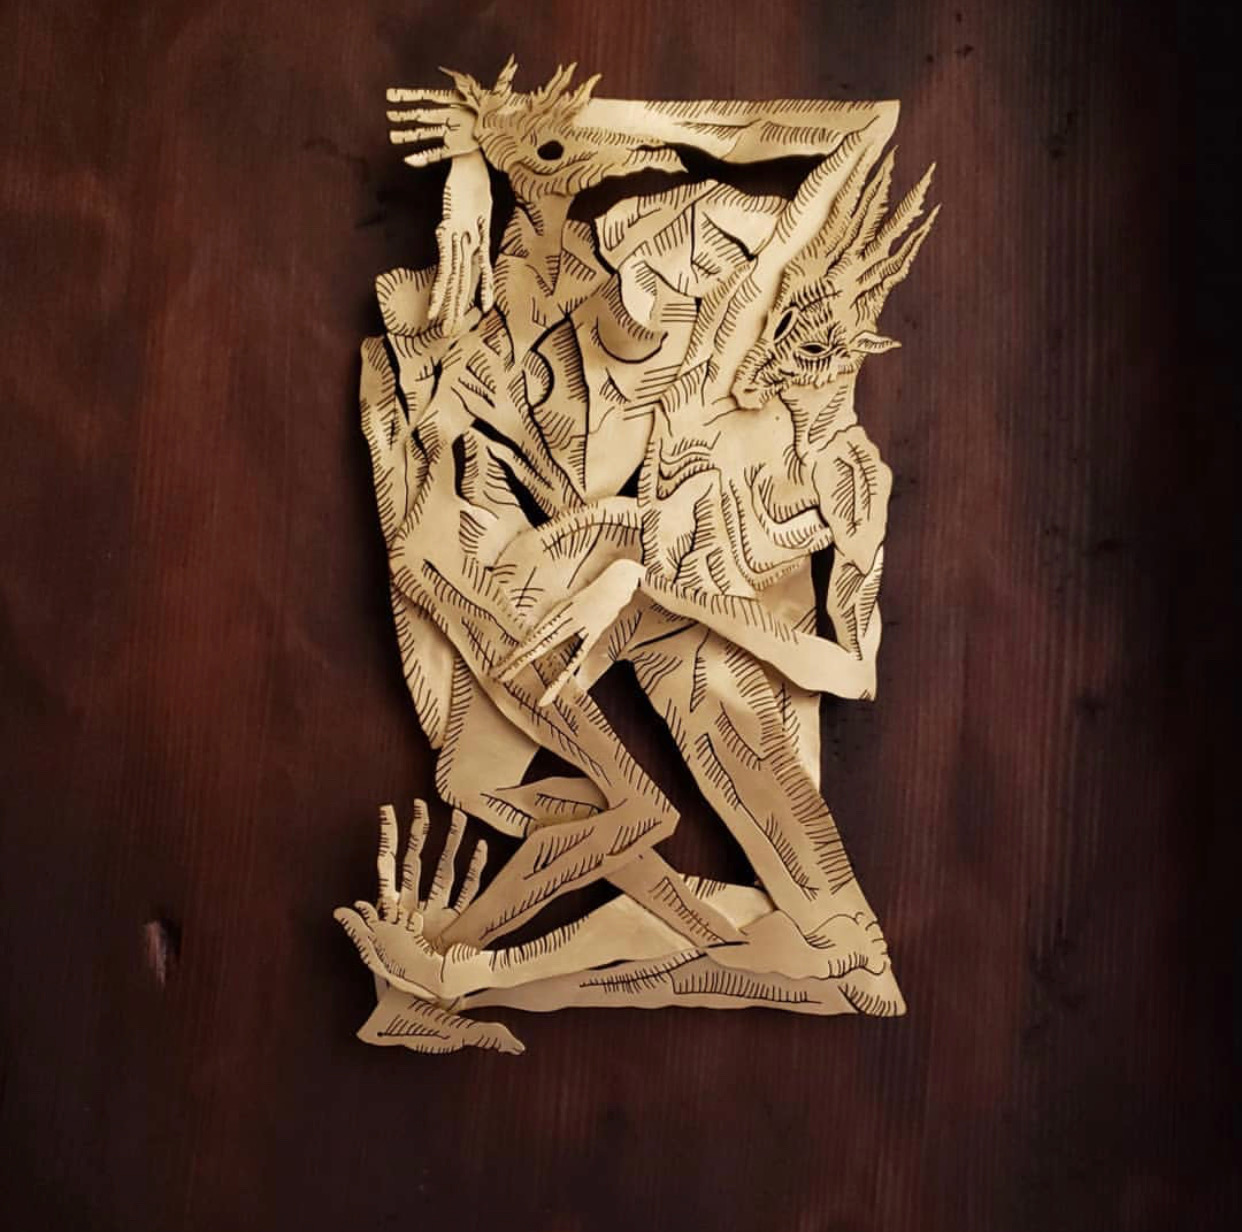 "TAVO MONTAVO & DANIEL ACOSTA COLLABORATION - ""Prelude"", handcut brass in handmade, reclaimed redwood shadow box frame15"" X 12"" X 3""$5,000"